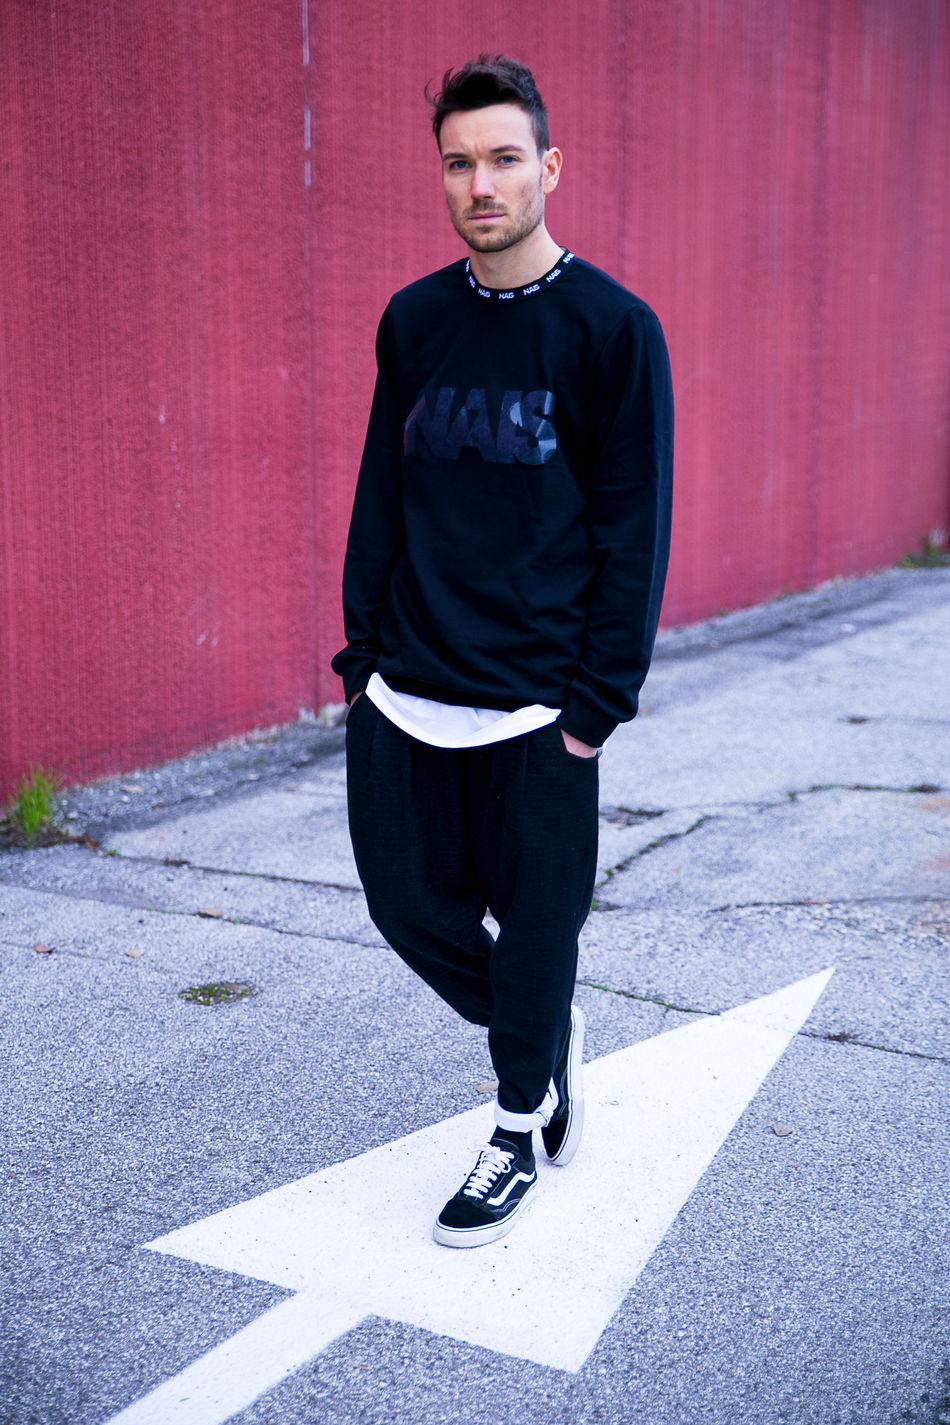 Man Model Modelling Nais Red Street